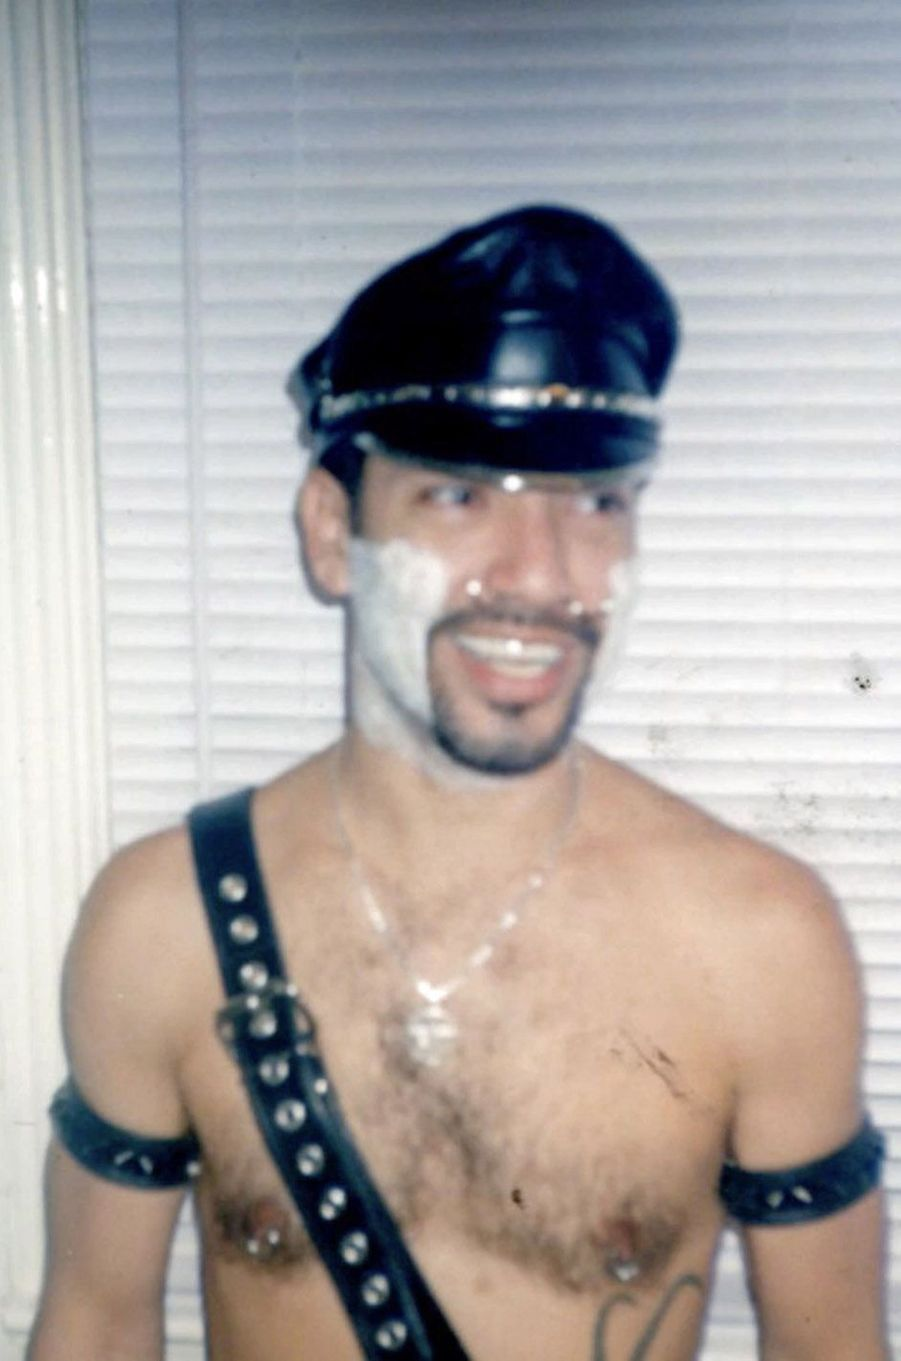 Richard Hernandez avant sa transformation.